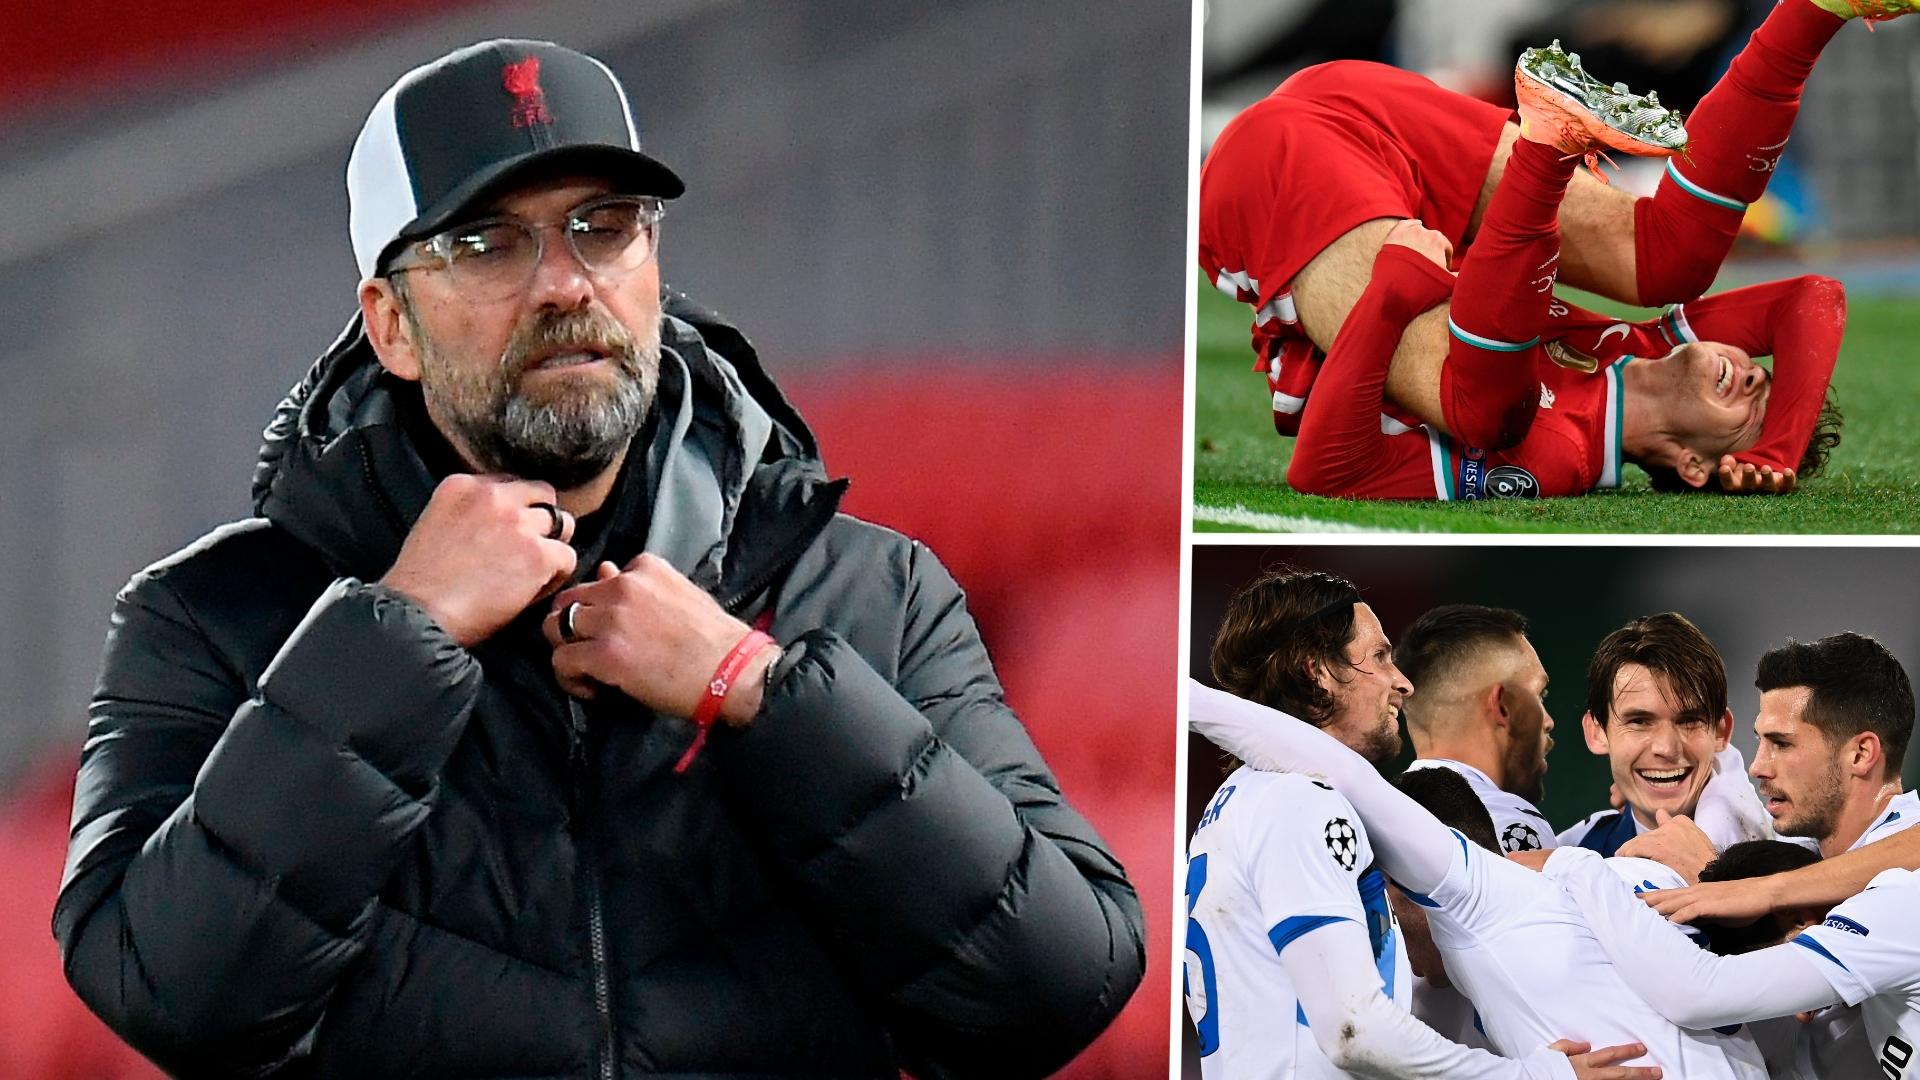 Liverpool 0-2 Atalanta: Jurgen Klopp's men stunned by second-half double